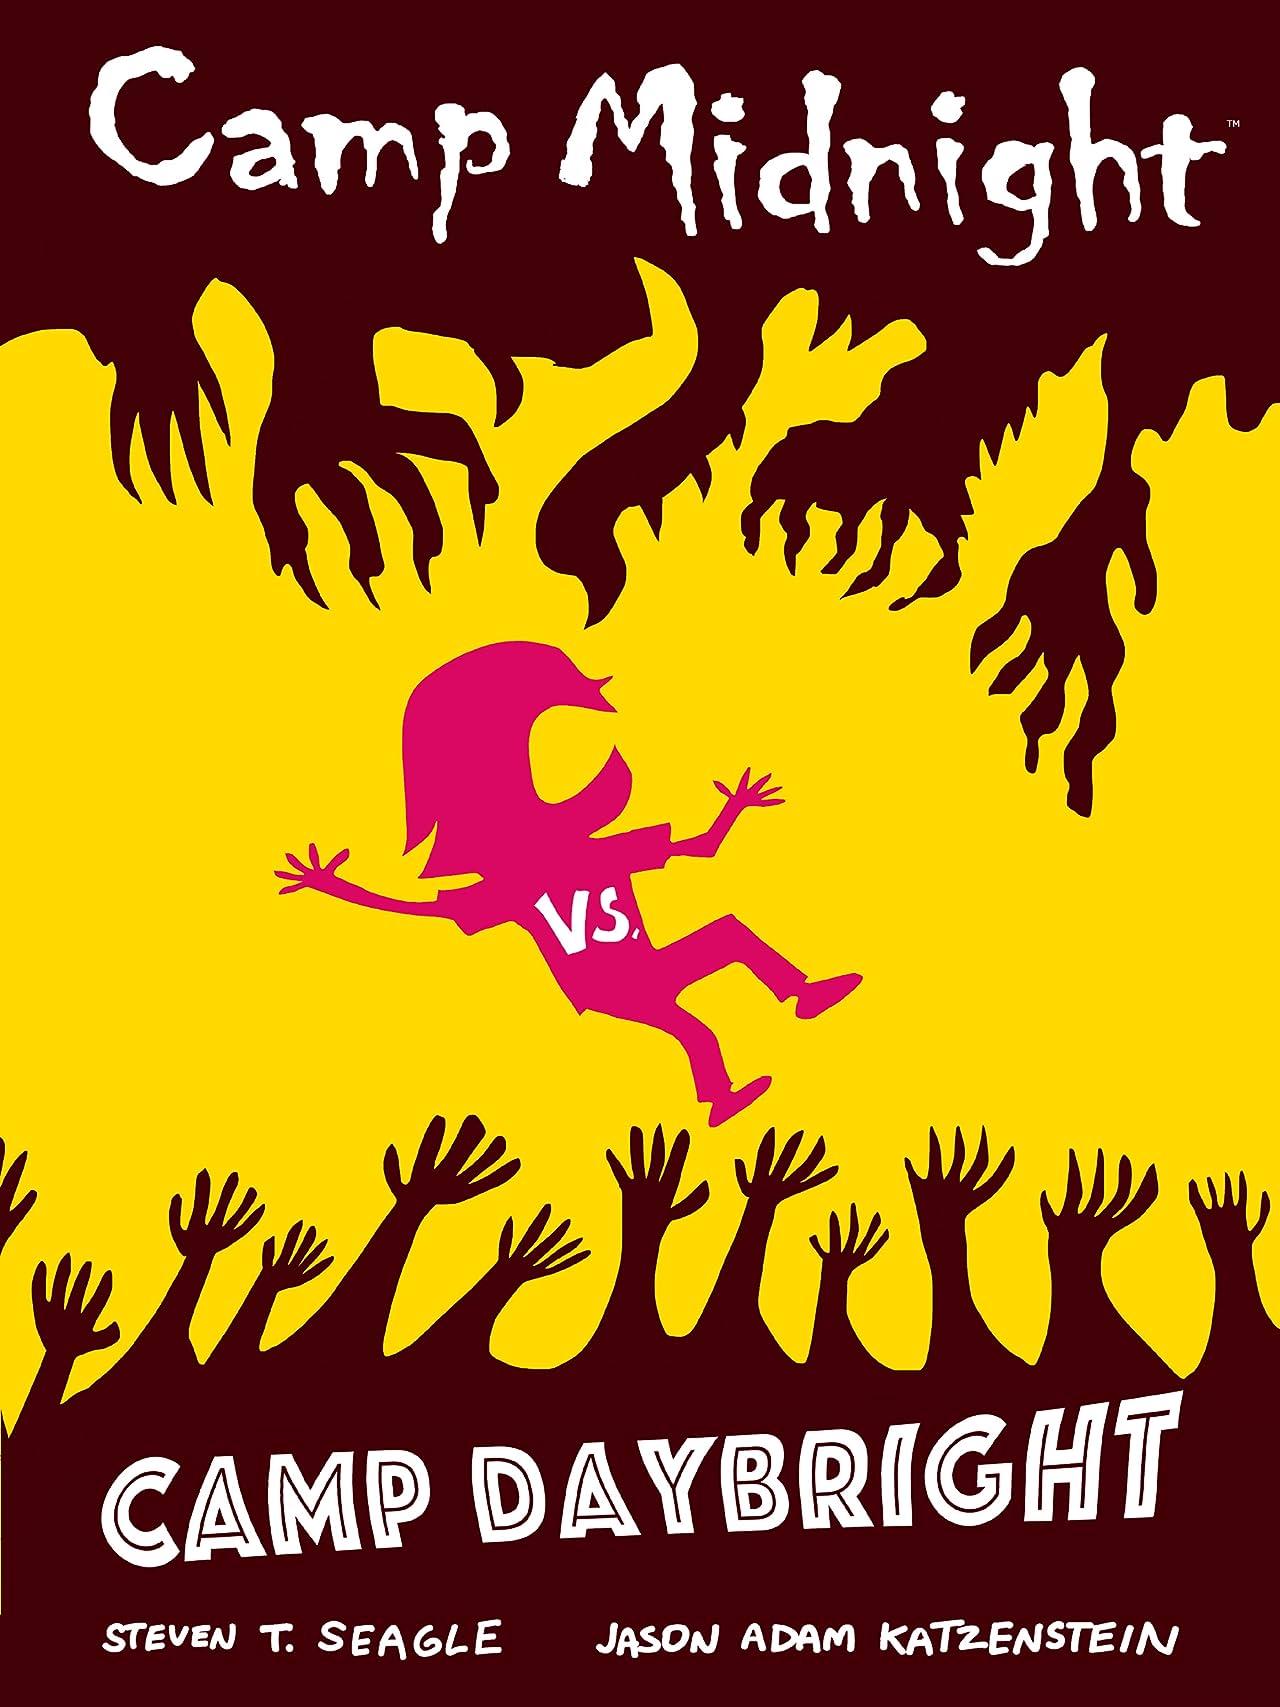 Camp Midnight Vol. 2: Camp Midnight Vs. Camp Daybright